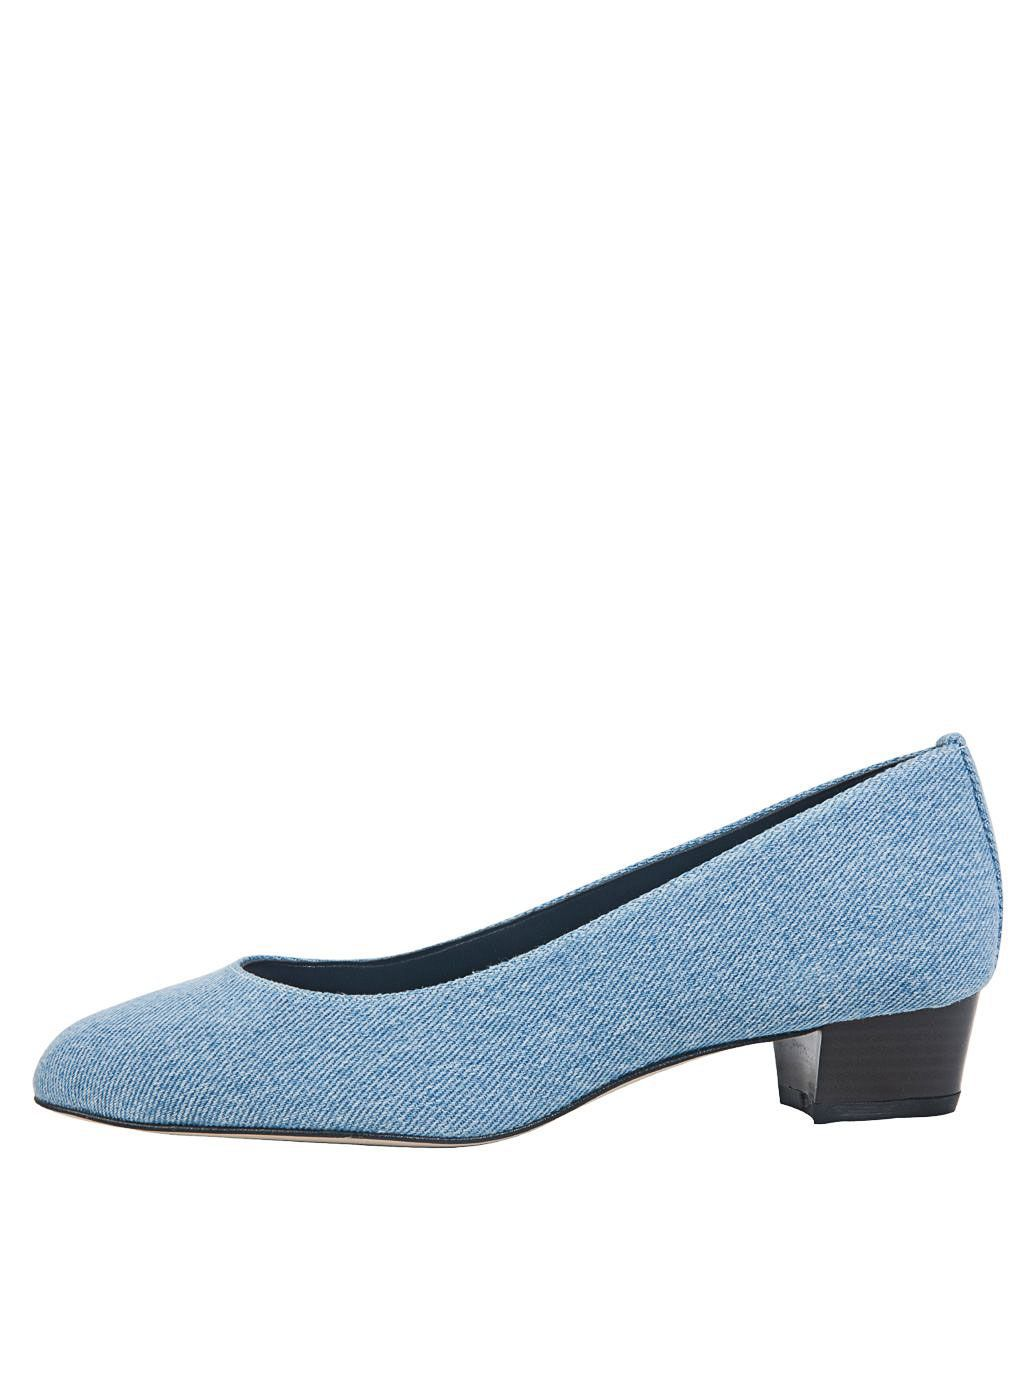 lesliep – Leslie Pump Shoe